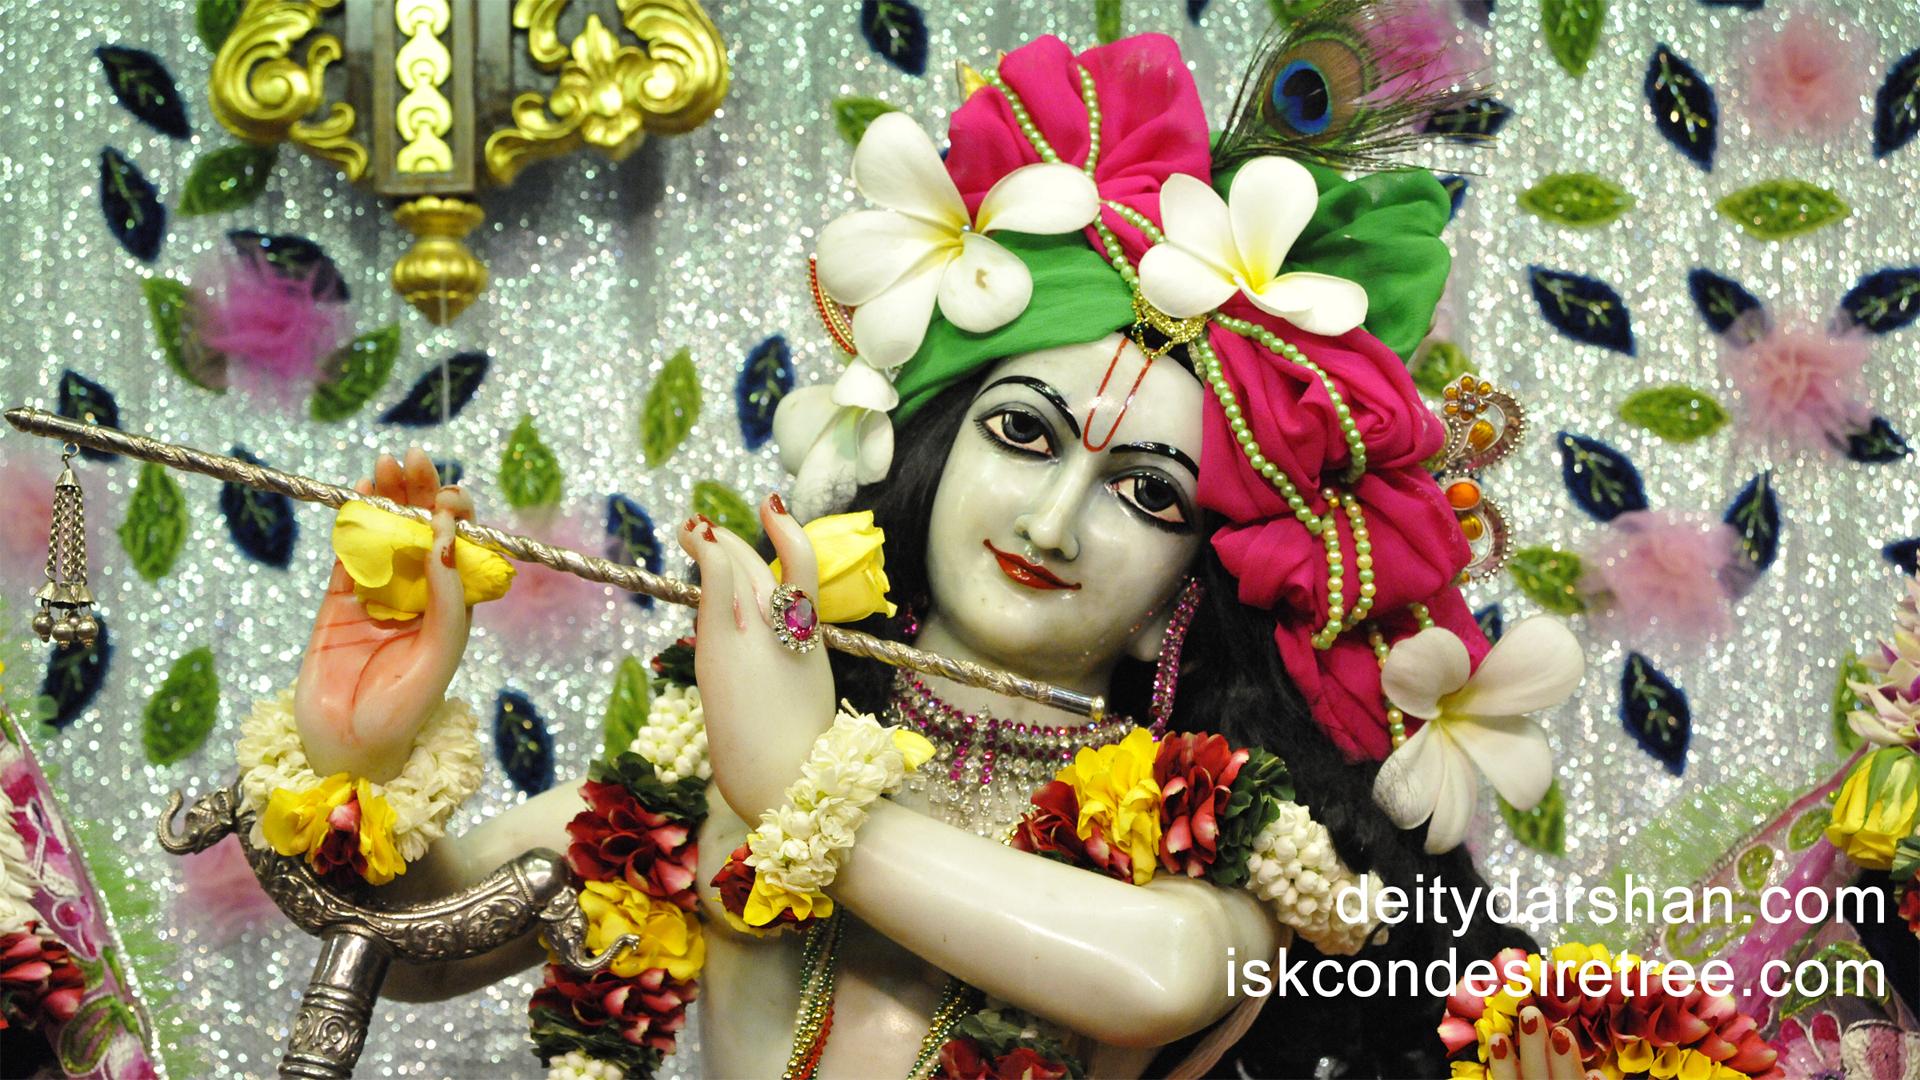 Sri Gopinath Close up Wallpaper (054) Size 1920x1080 Download